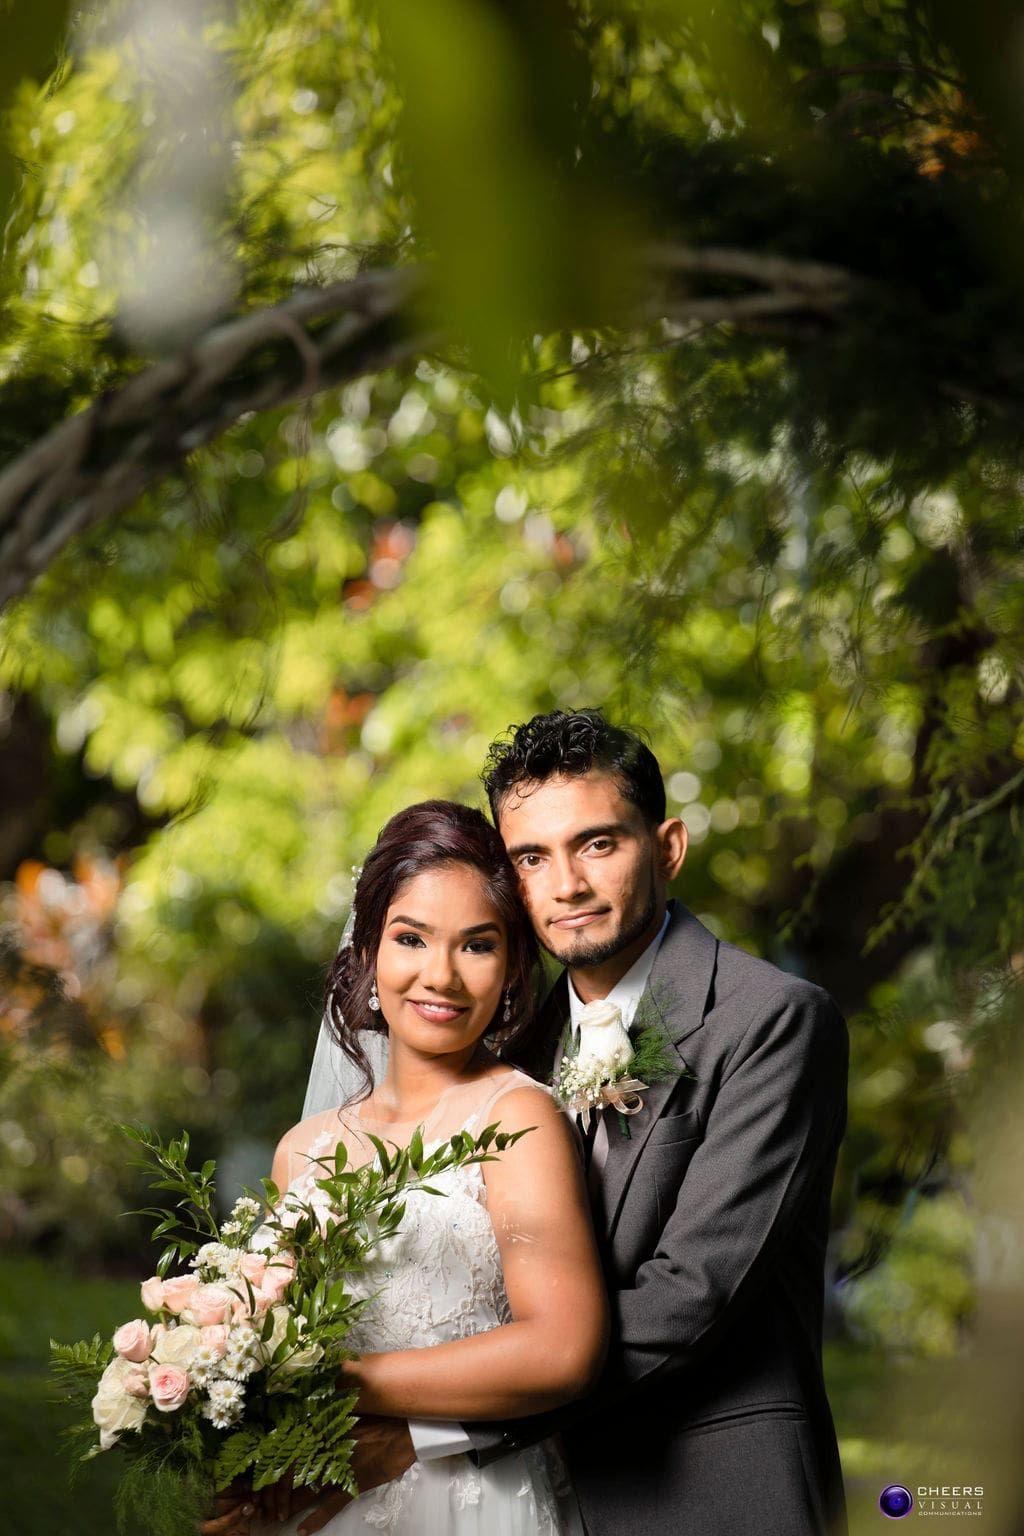 Rianne Heera S Sweet Outdoor Wedding In Trinidad Tobago Destination Wedding Accessories Outdoor Wedding East Indian Wedding